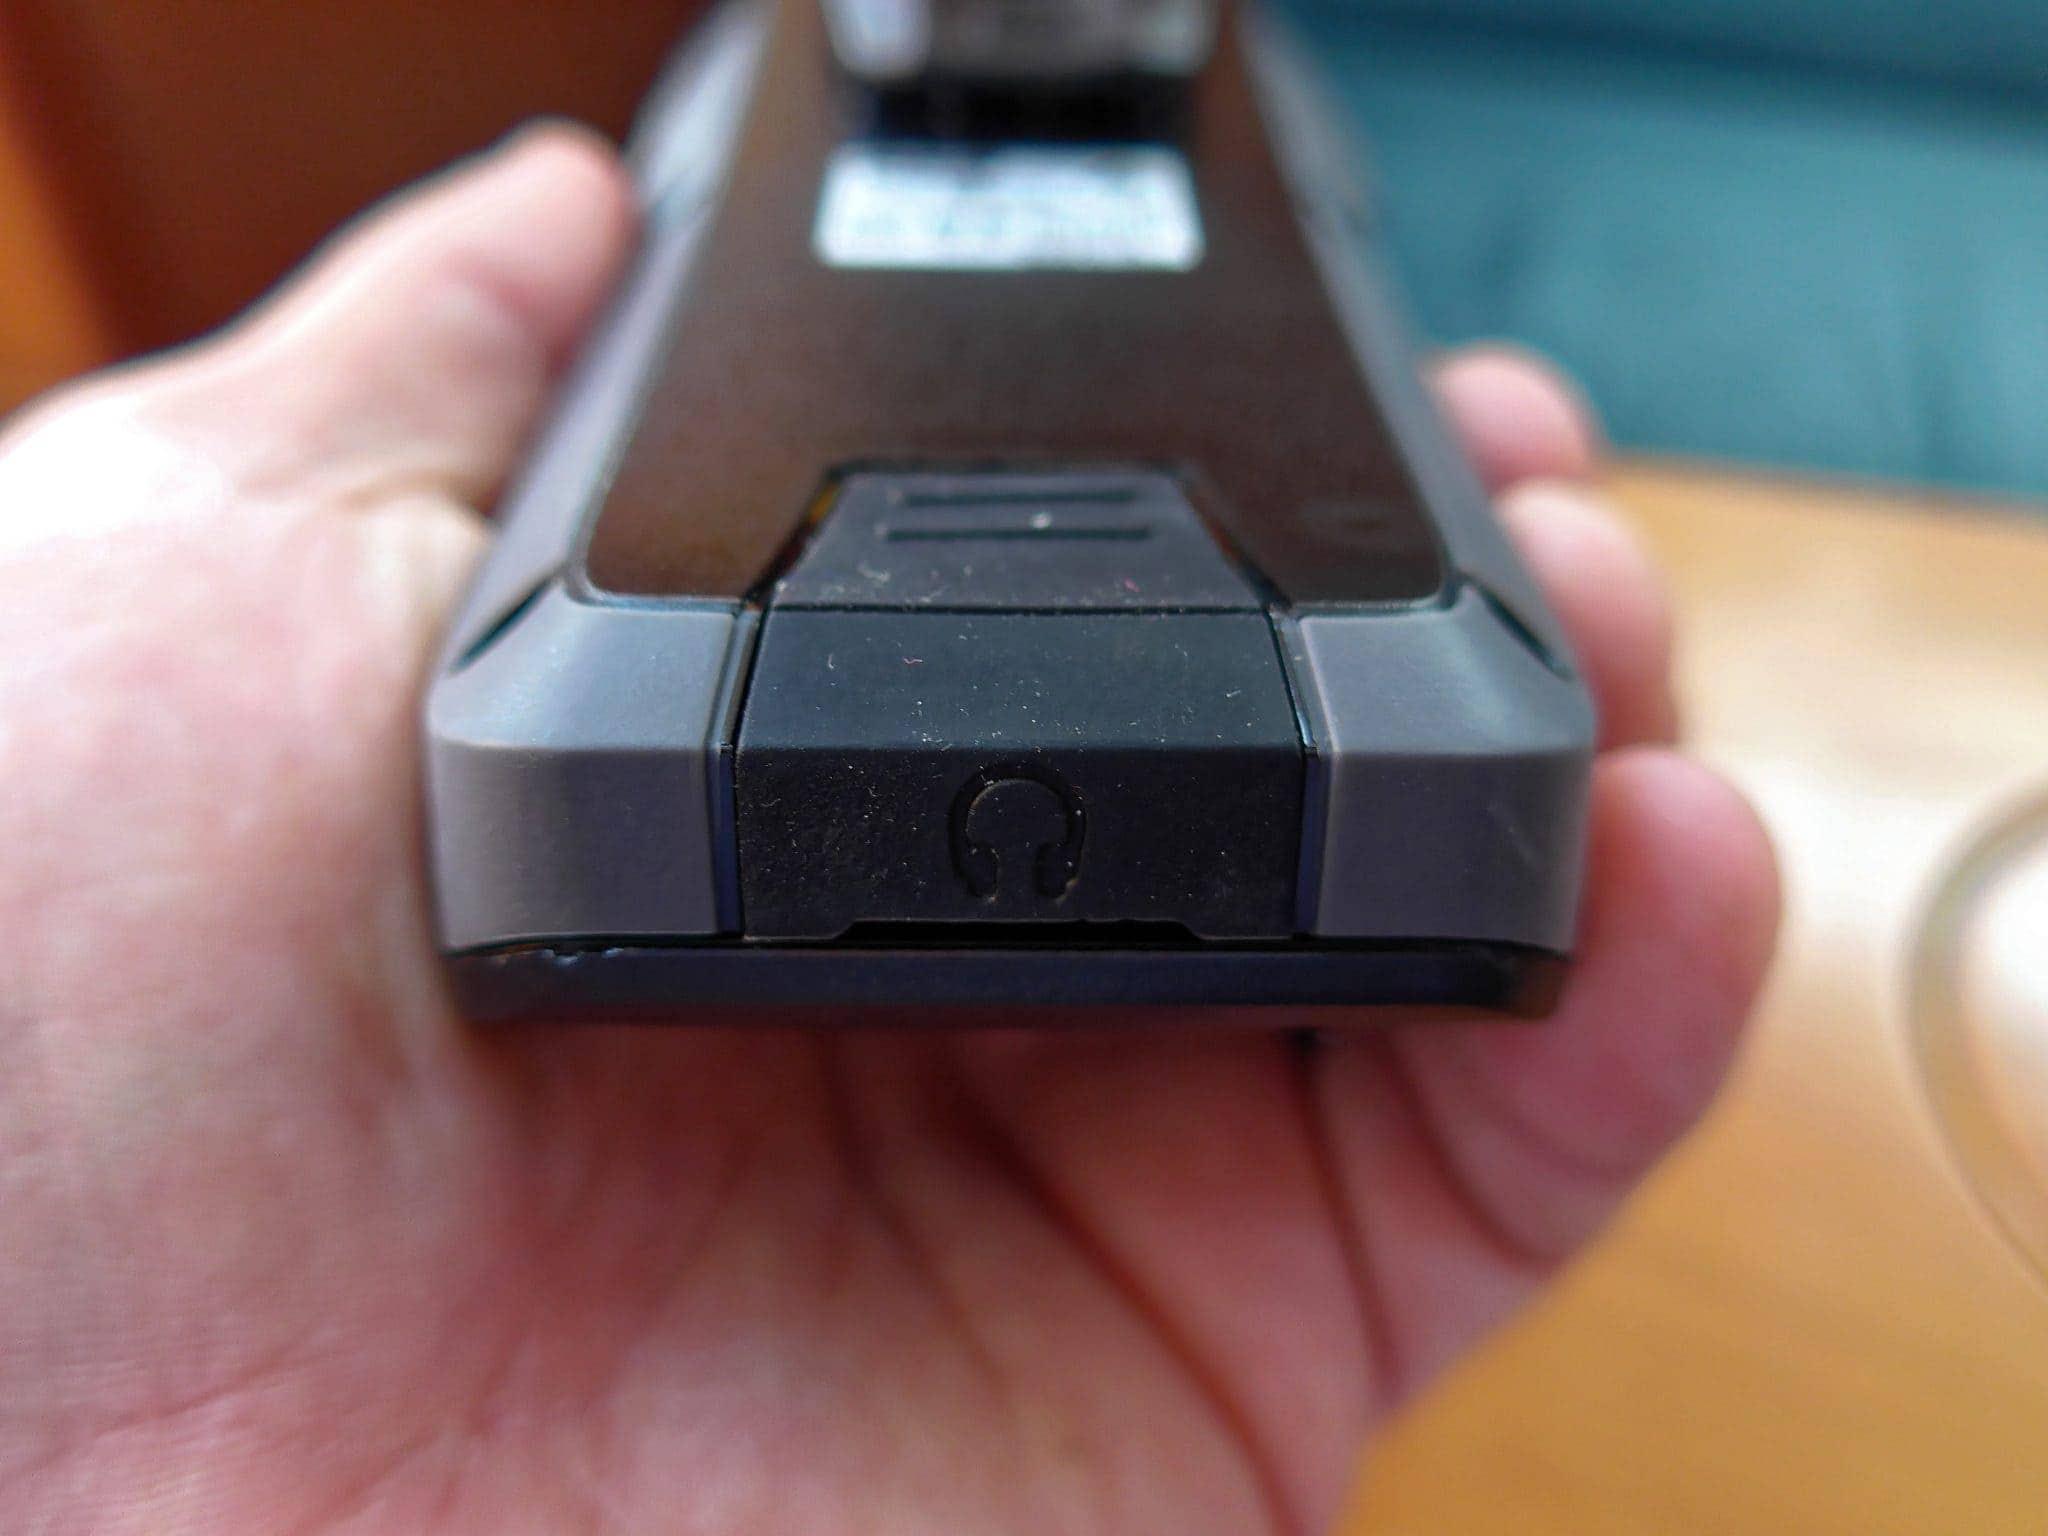 Bottom showing headphone port